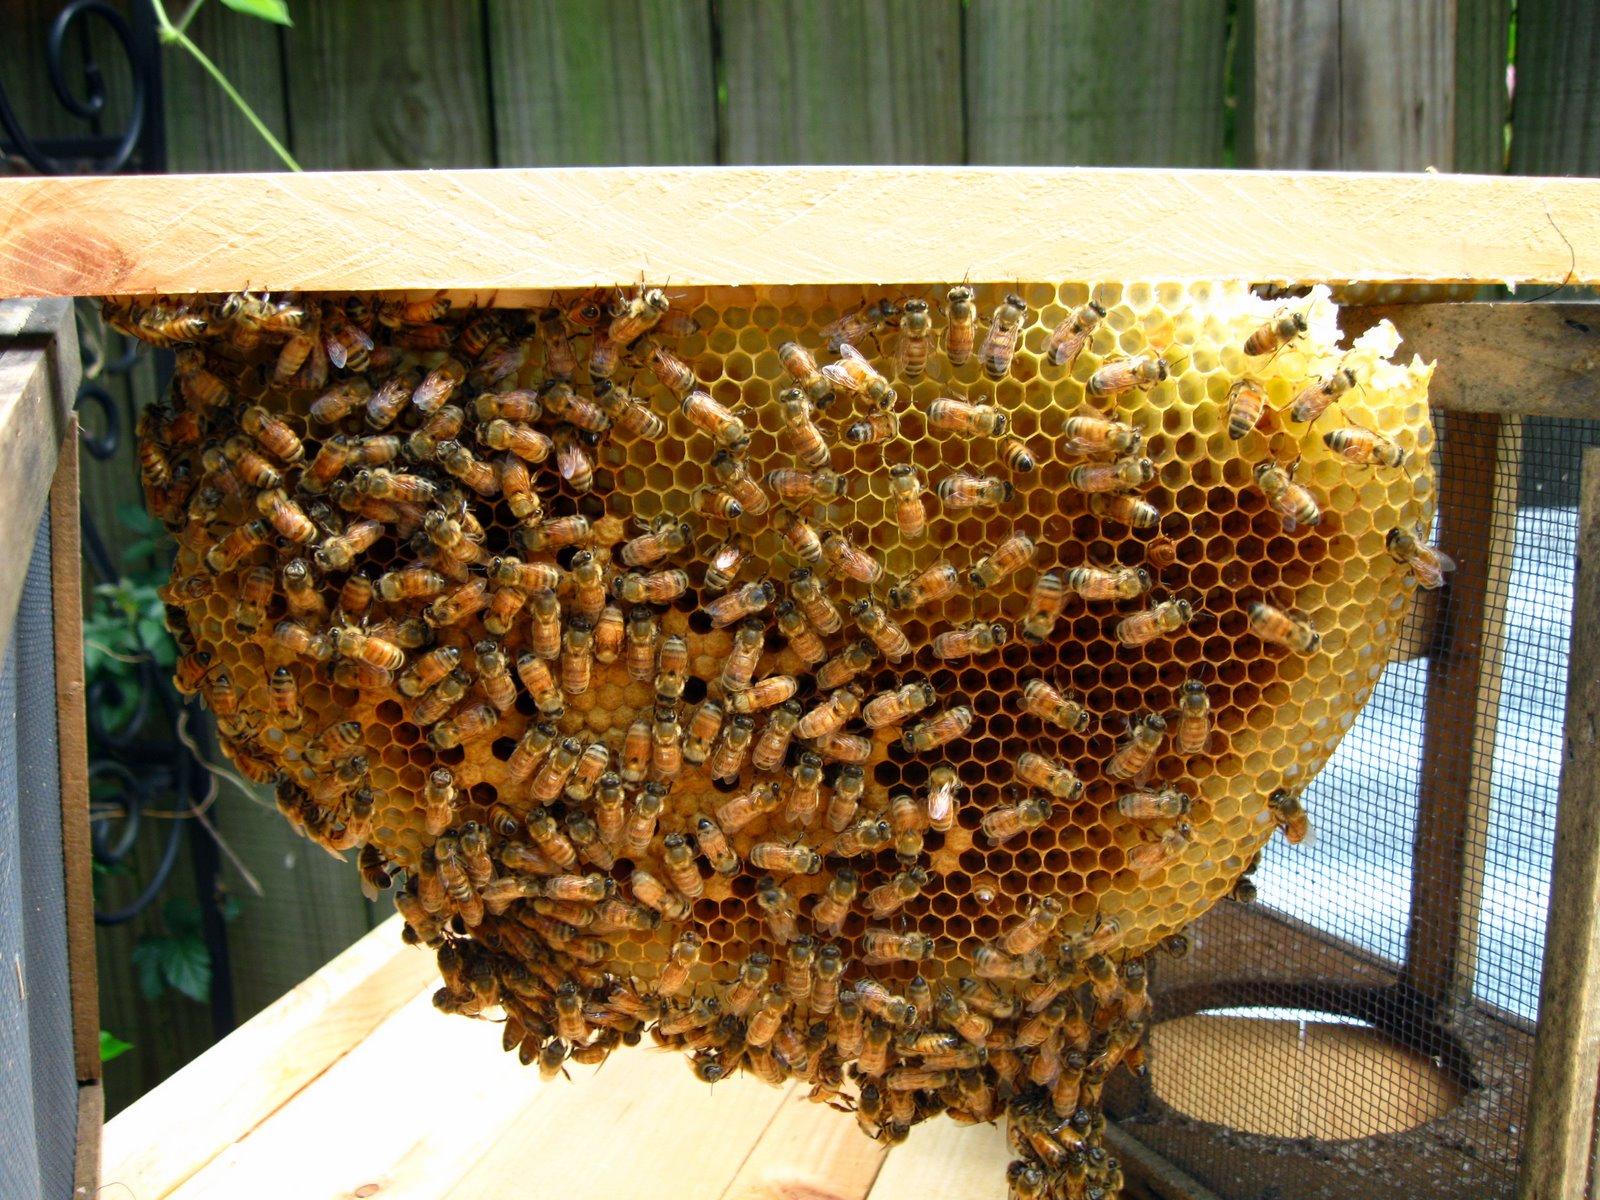 Honey Bees Top Bar Hive